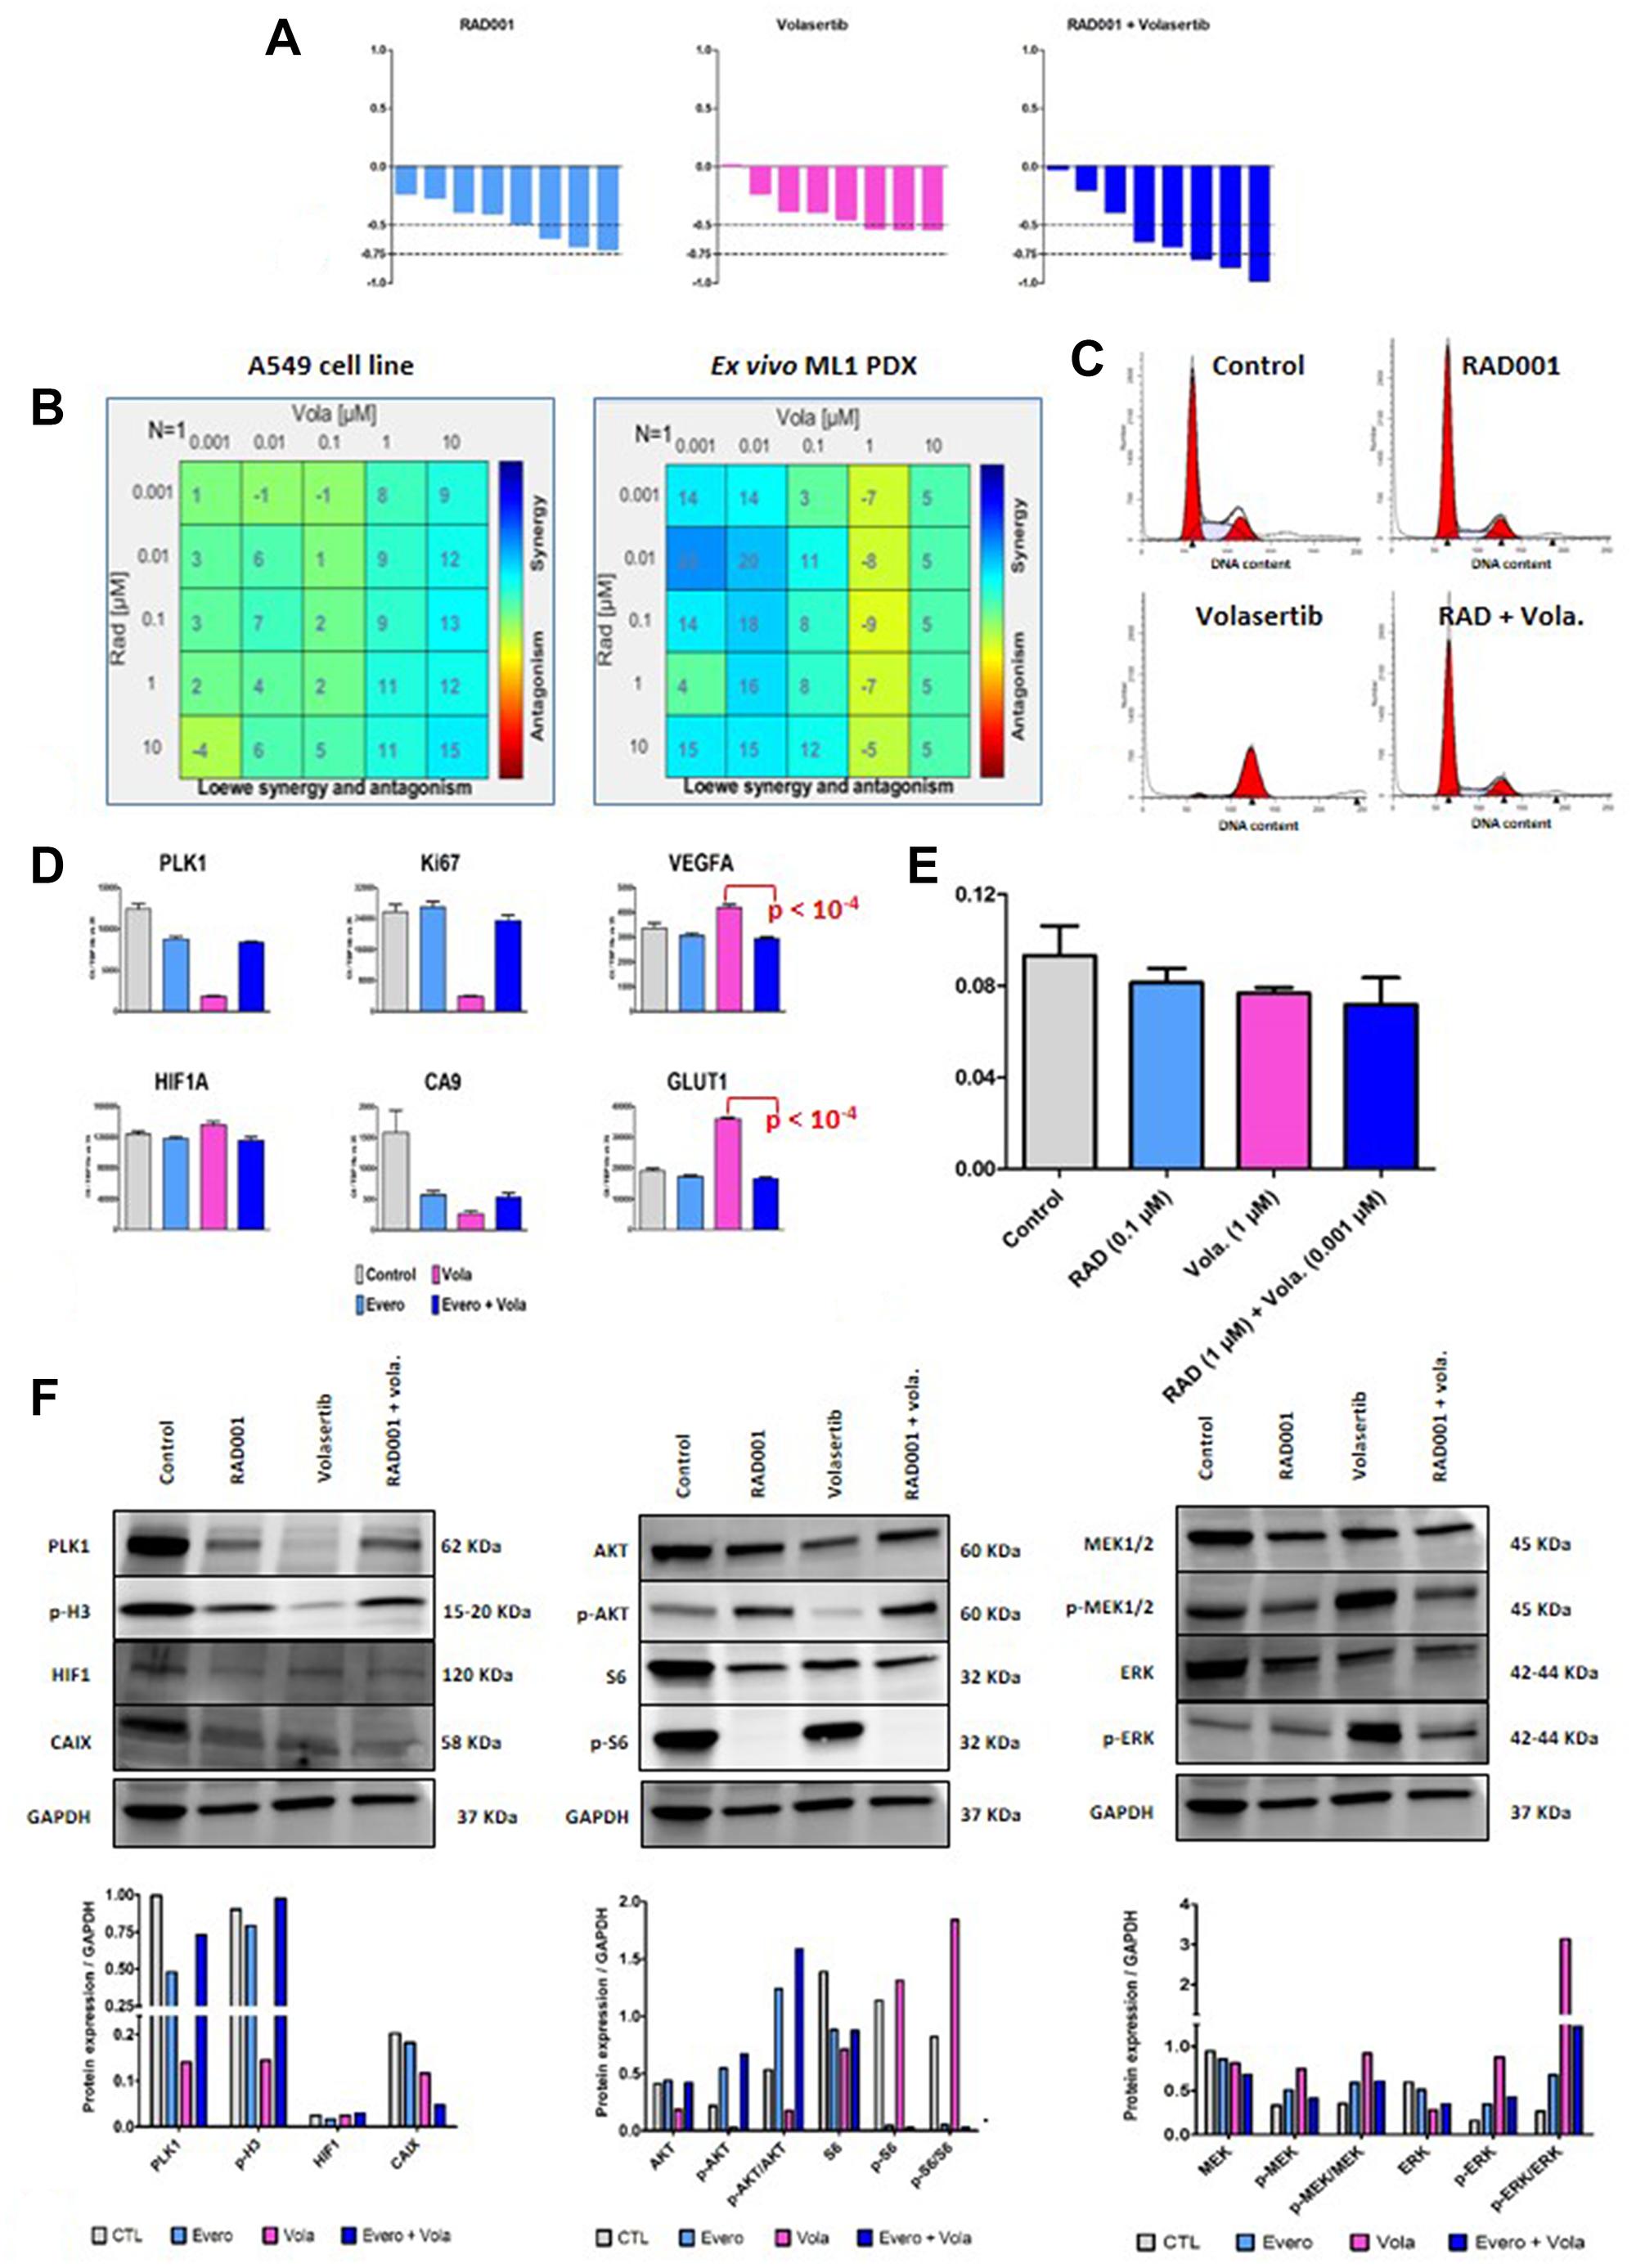 In vitro study of RAD001 (everolimus) + volasertib combination.